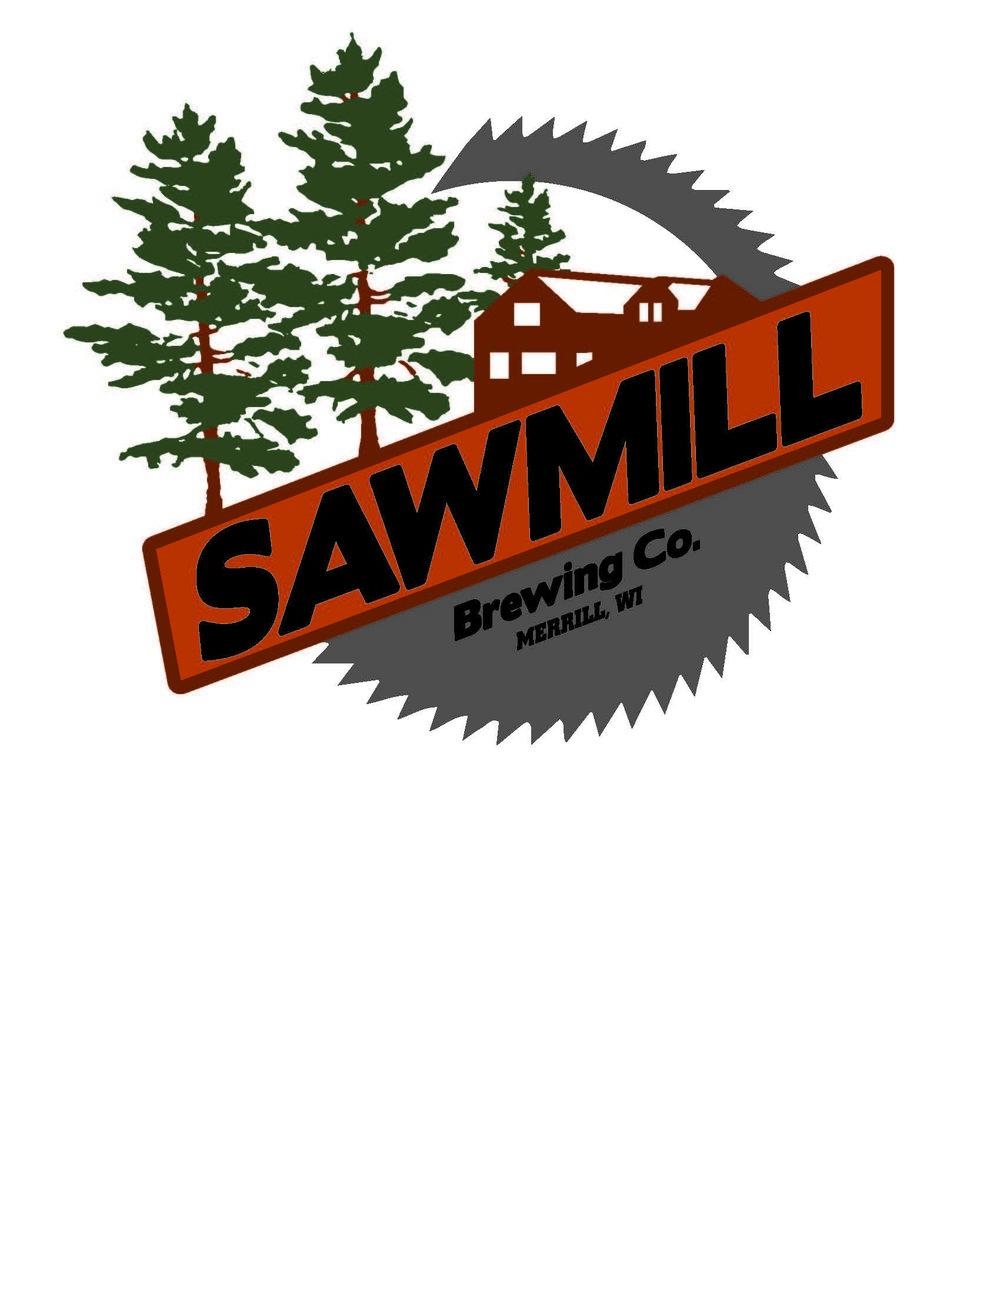 Sawmillcolor.jpg